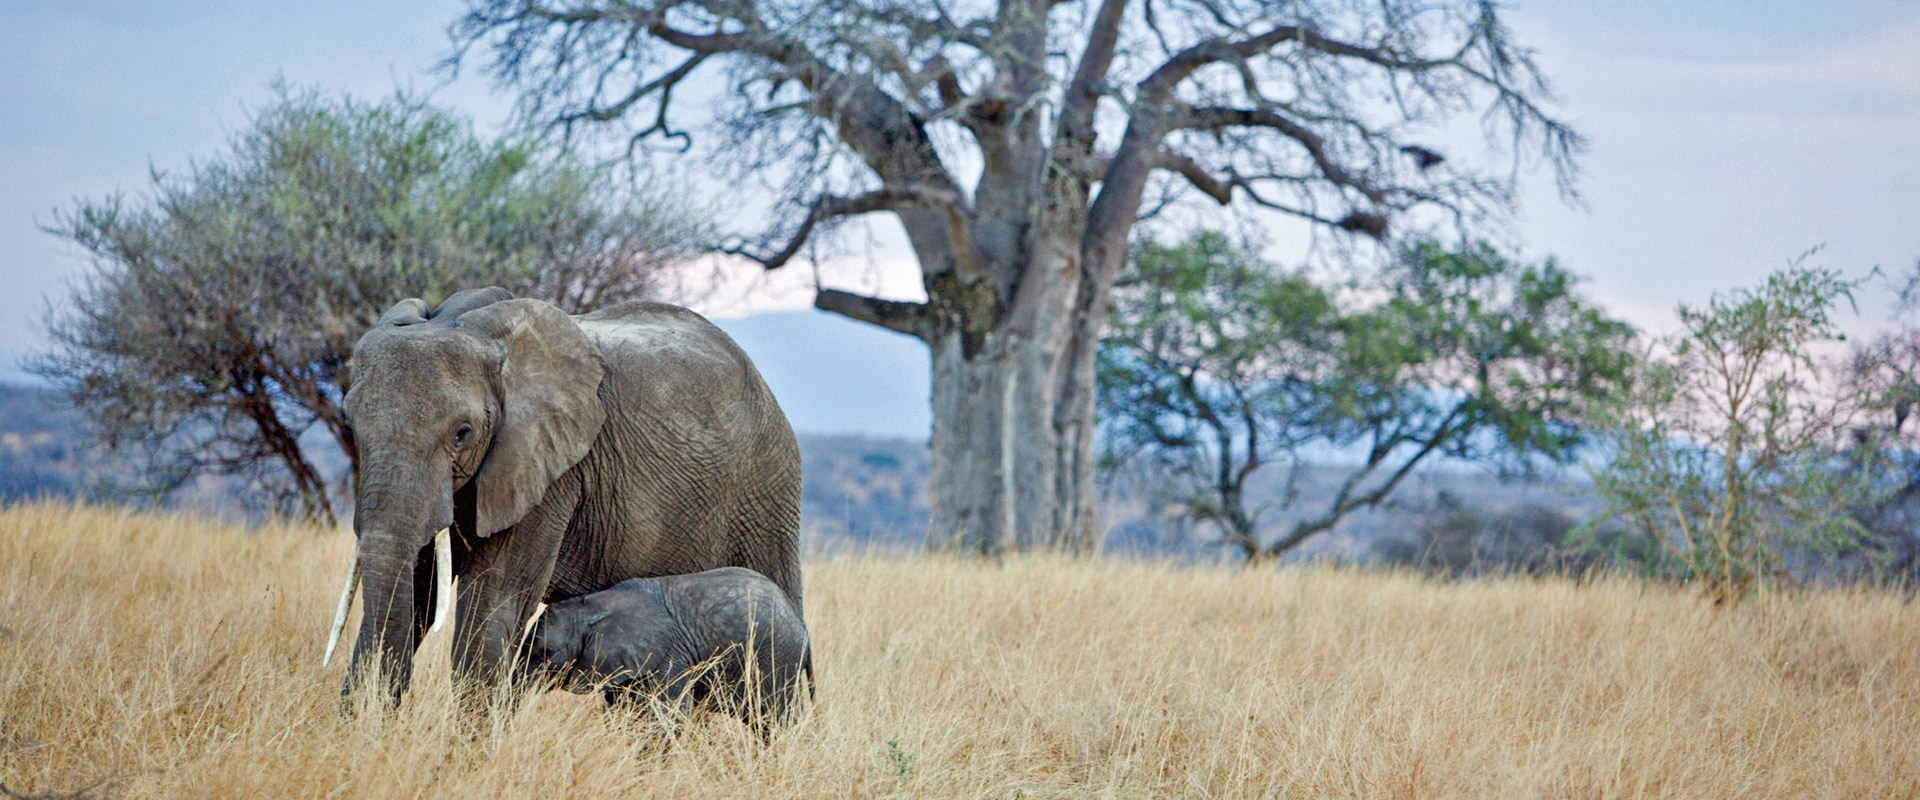 18 Days Tanzania Combined Safari